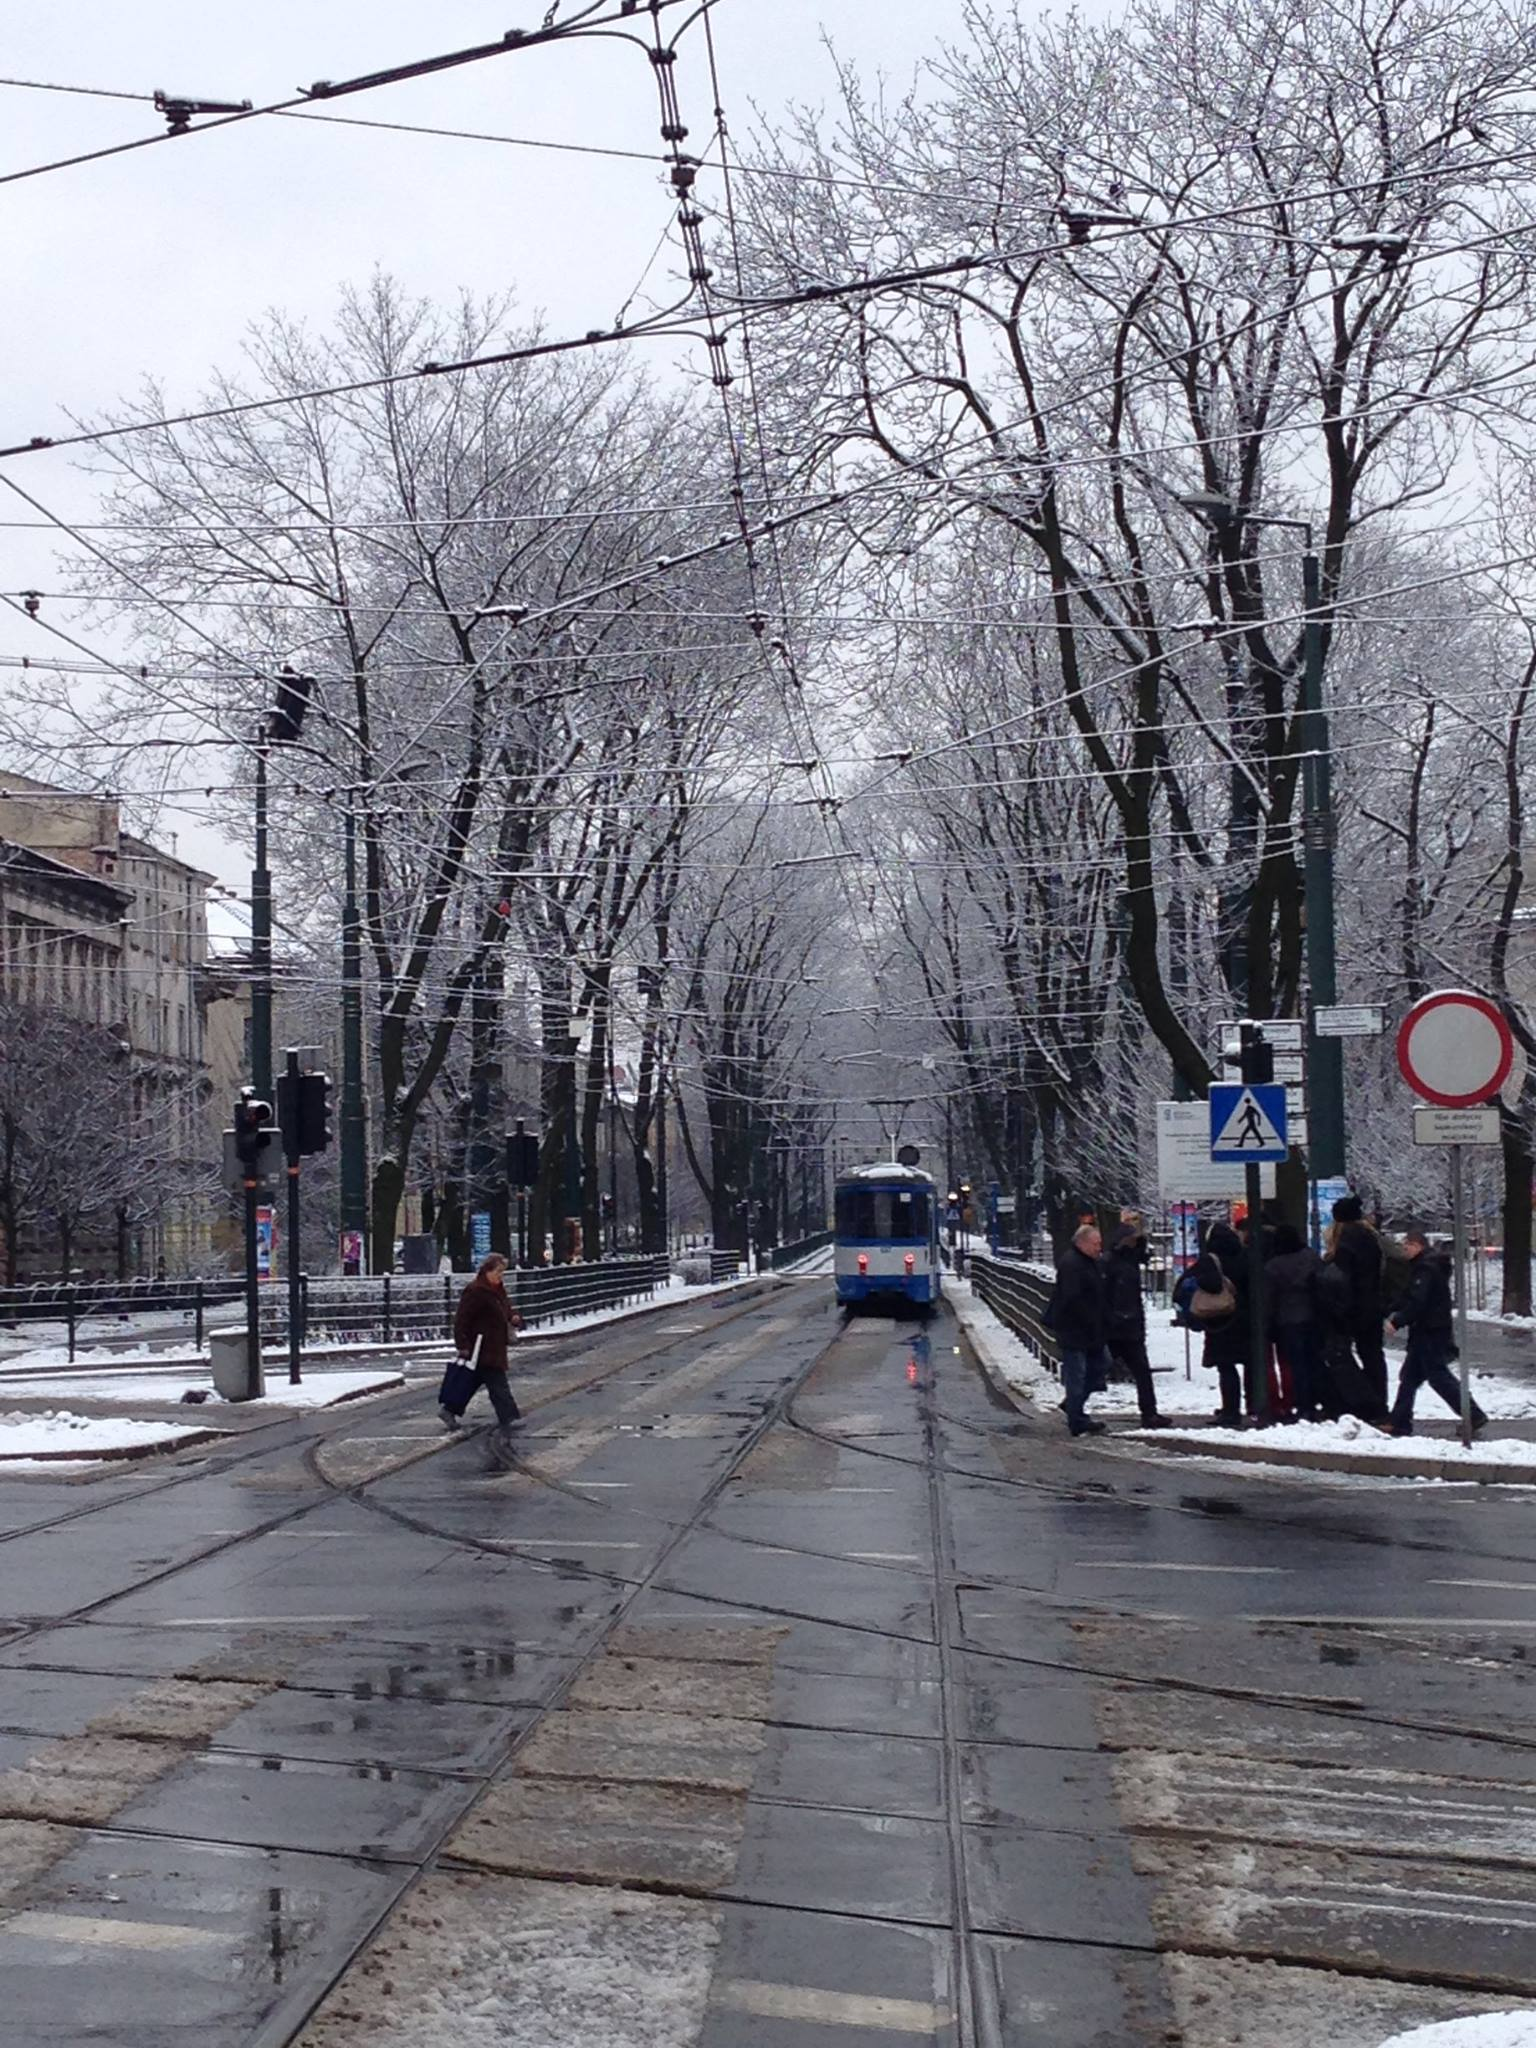 Krakow-Trams-Winter-Snow